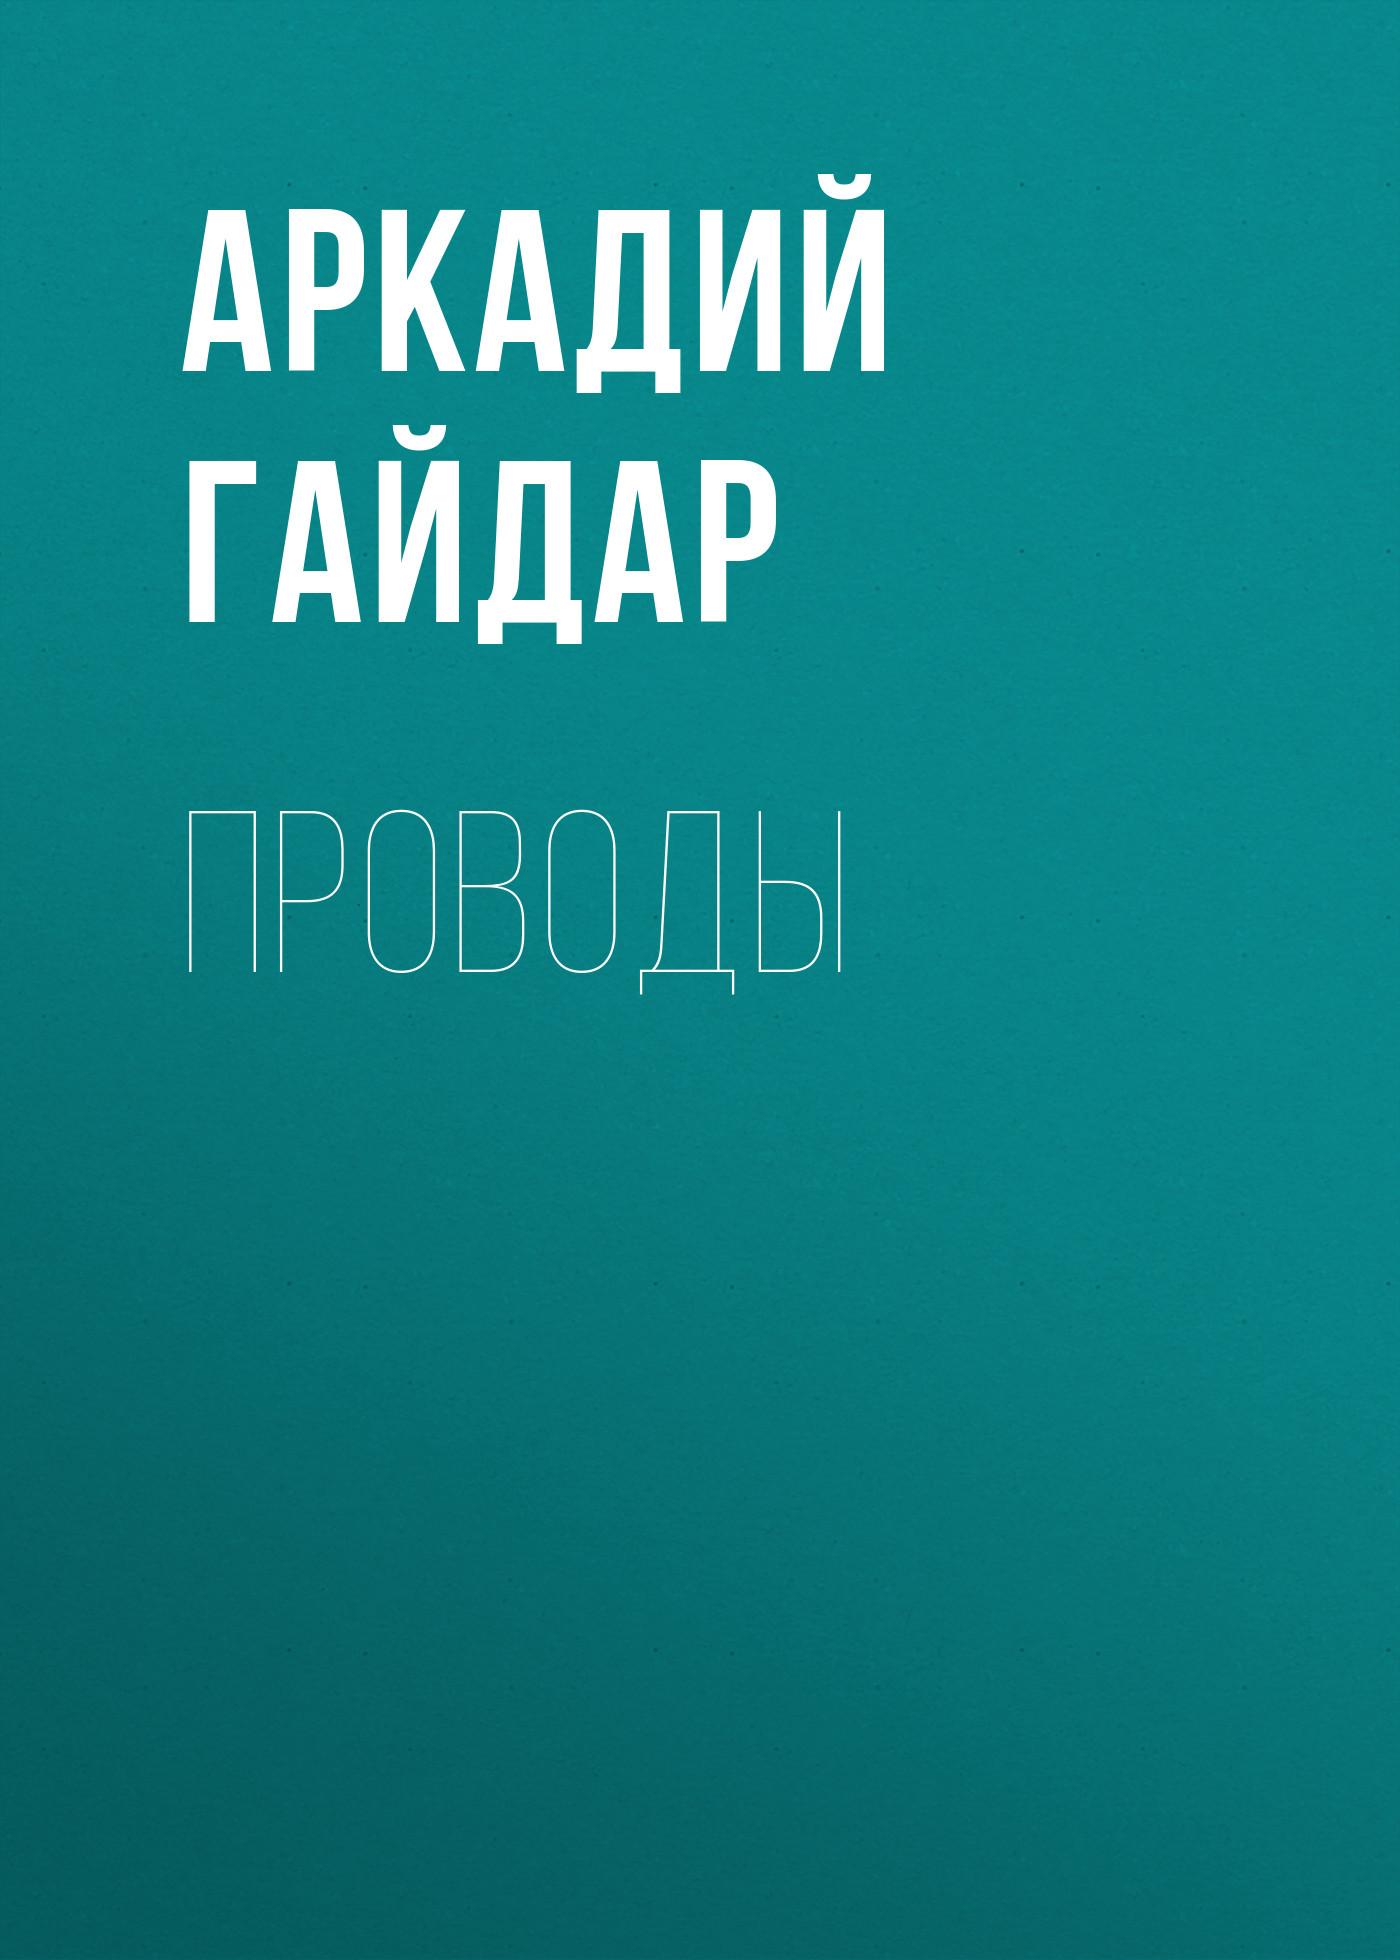 Аркадий Гайдар Проводы цена